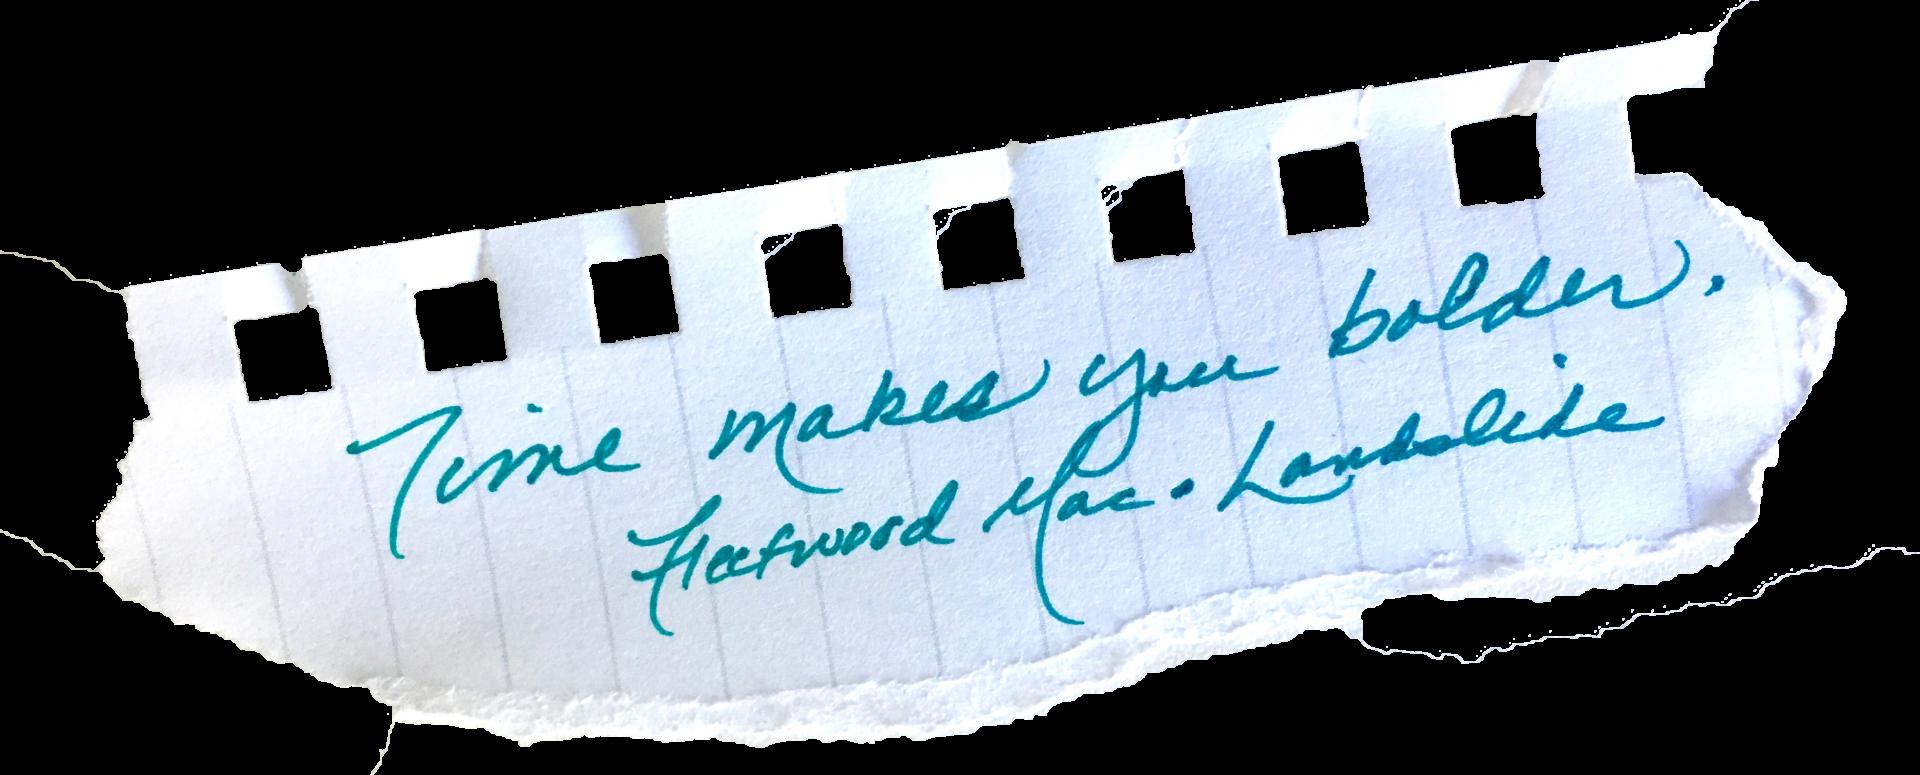 Fleetwood Mac Landslide Lyrics on Paper Scrap